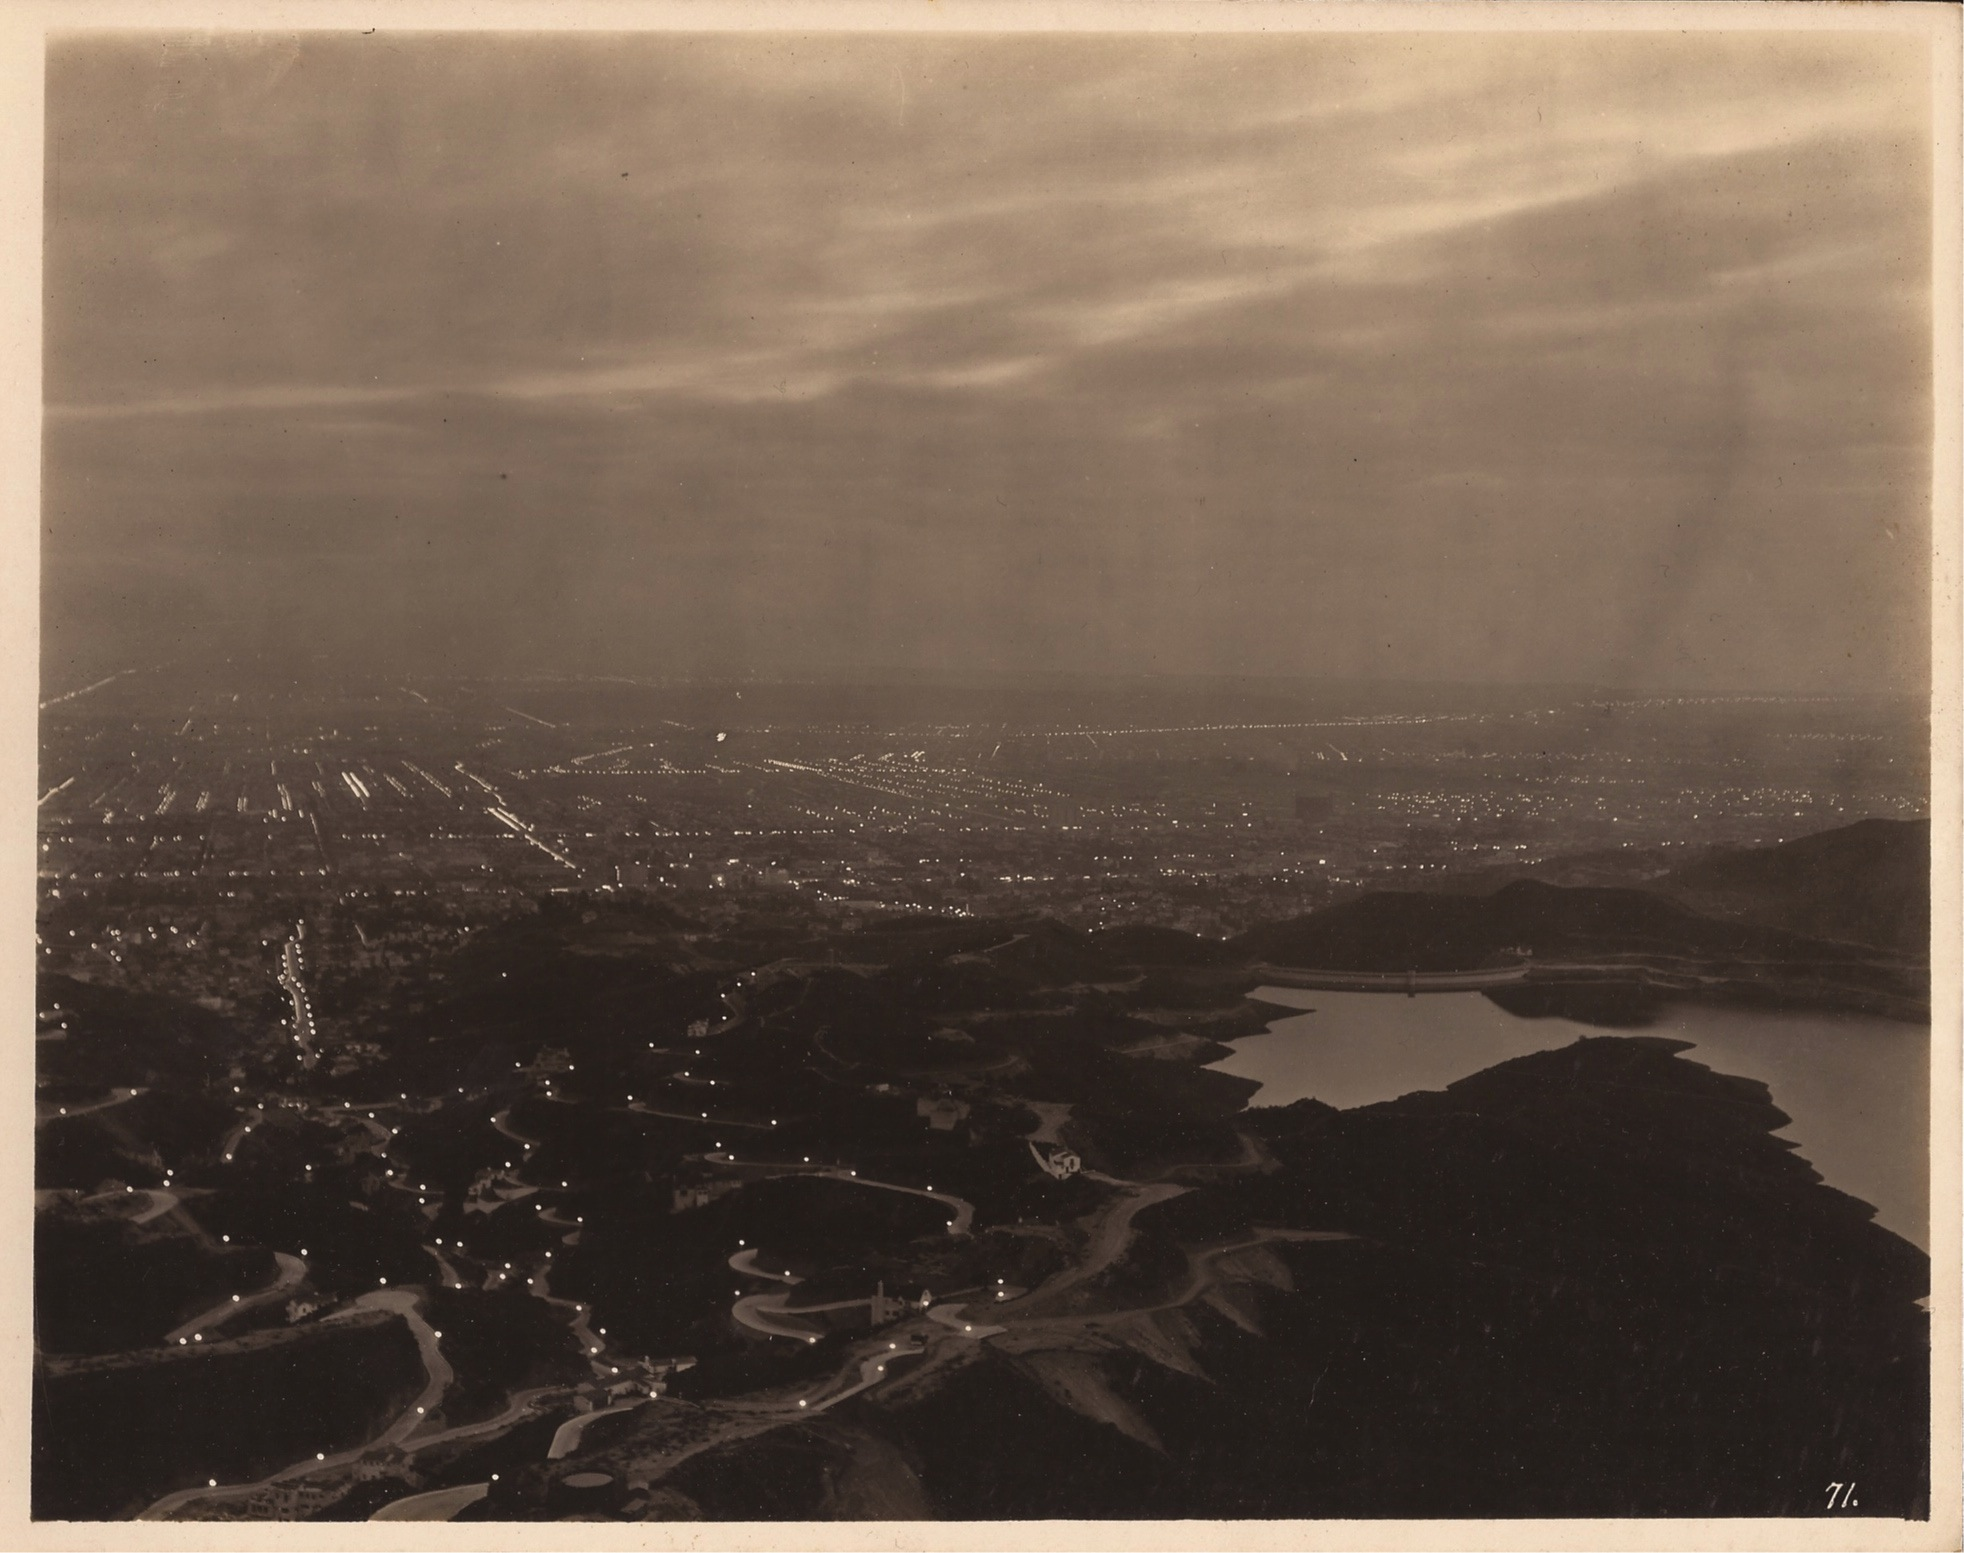 Hollywoodland And Lake Hollywood Circa 1925 Courtesy Martijn Veltman